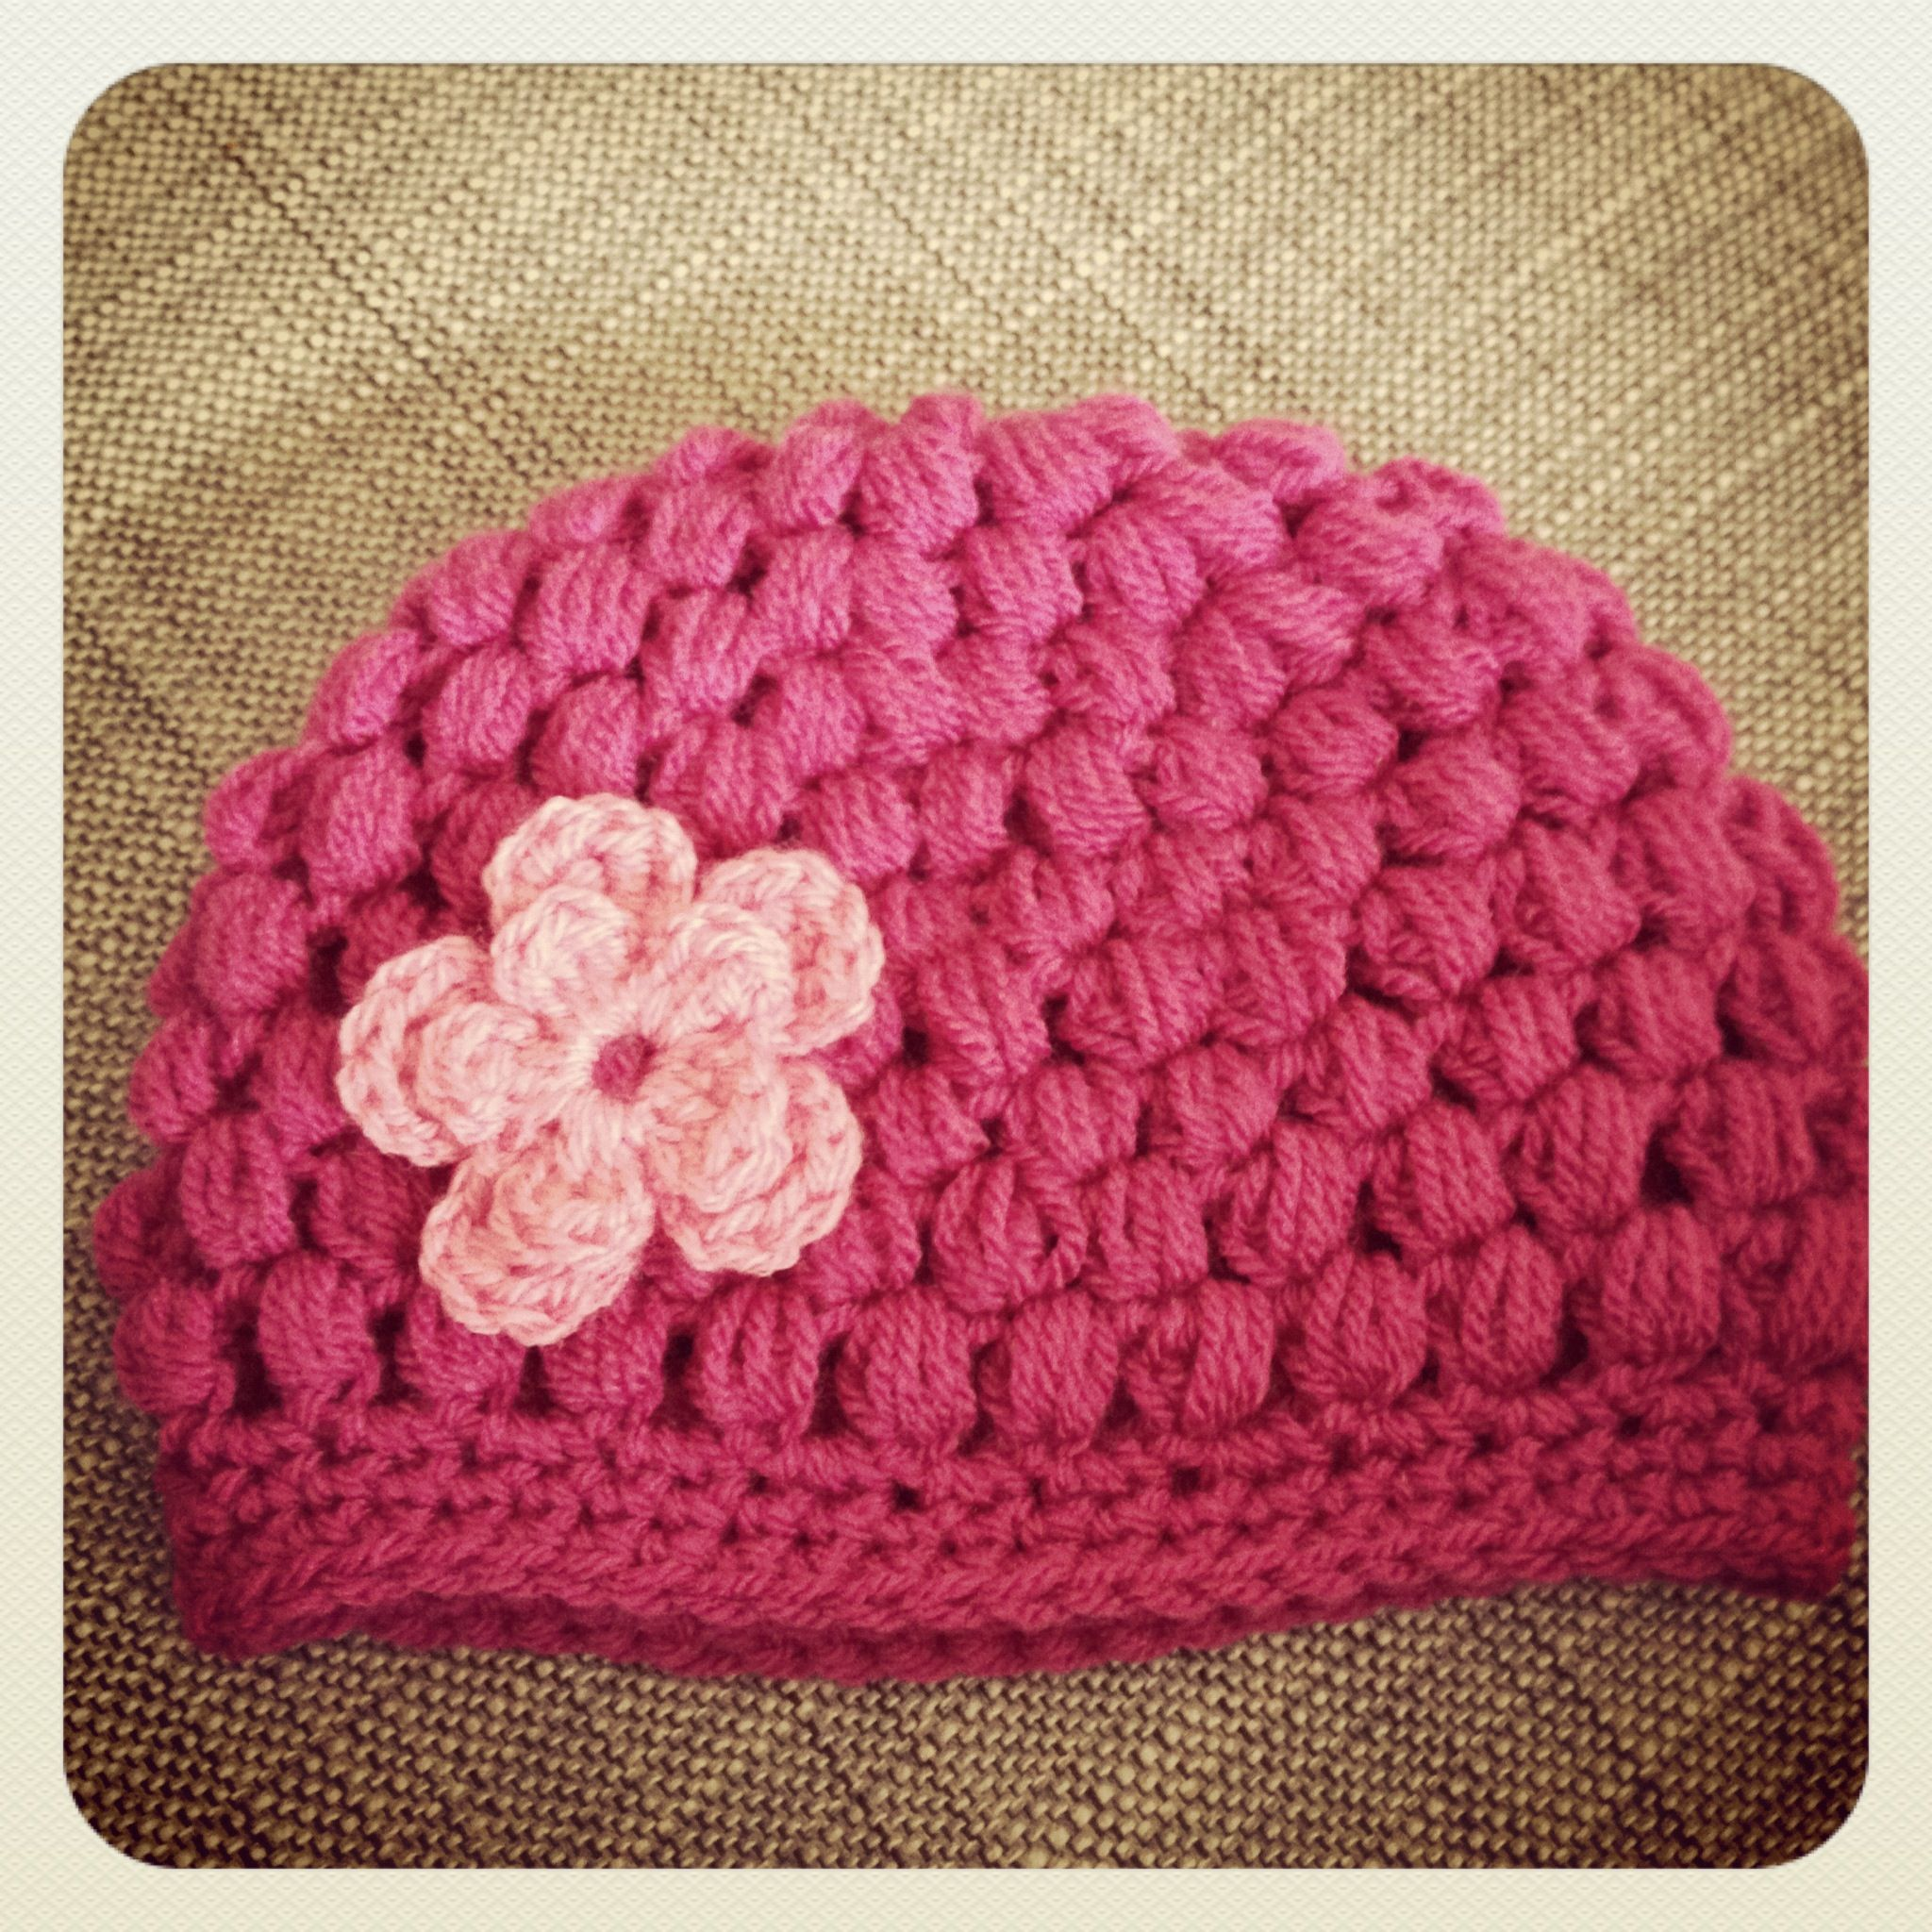 Crochet Hat Pattern With Puff Stitch : Puff stitch hat Crochet Crazy! Pinterest